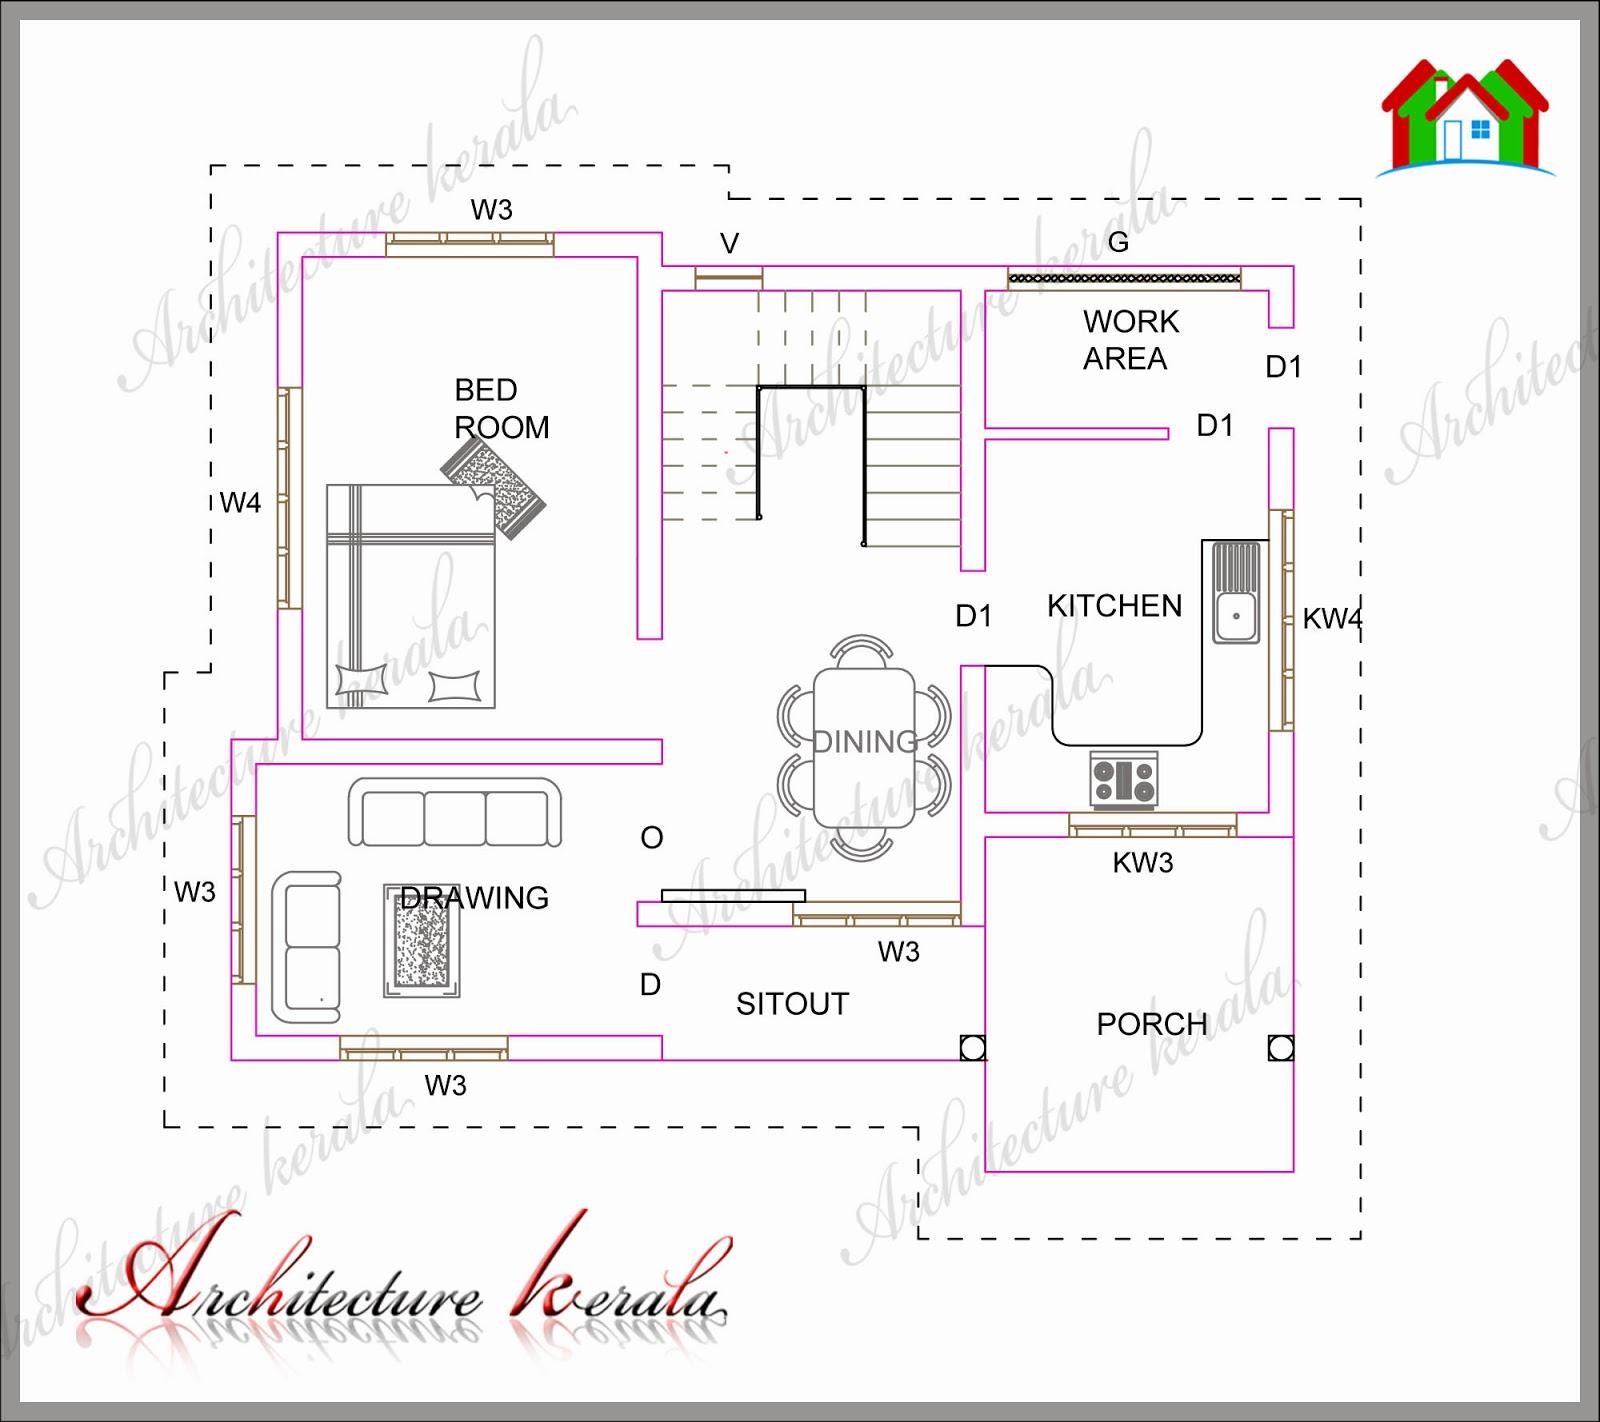 veedu plans studio guest house plans tiny house plans modern veedu plan basement plans free free floorplan design architecture keala october plan 183 veedu planhtml